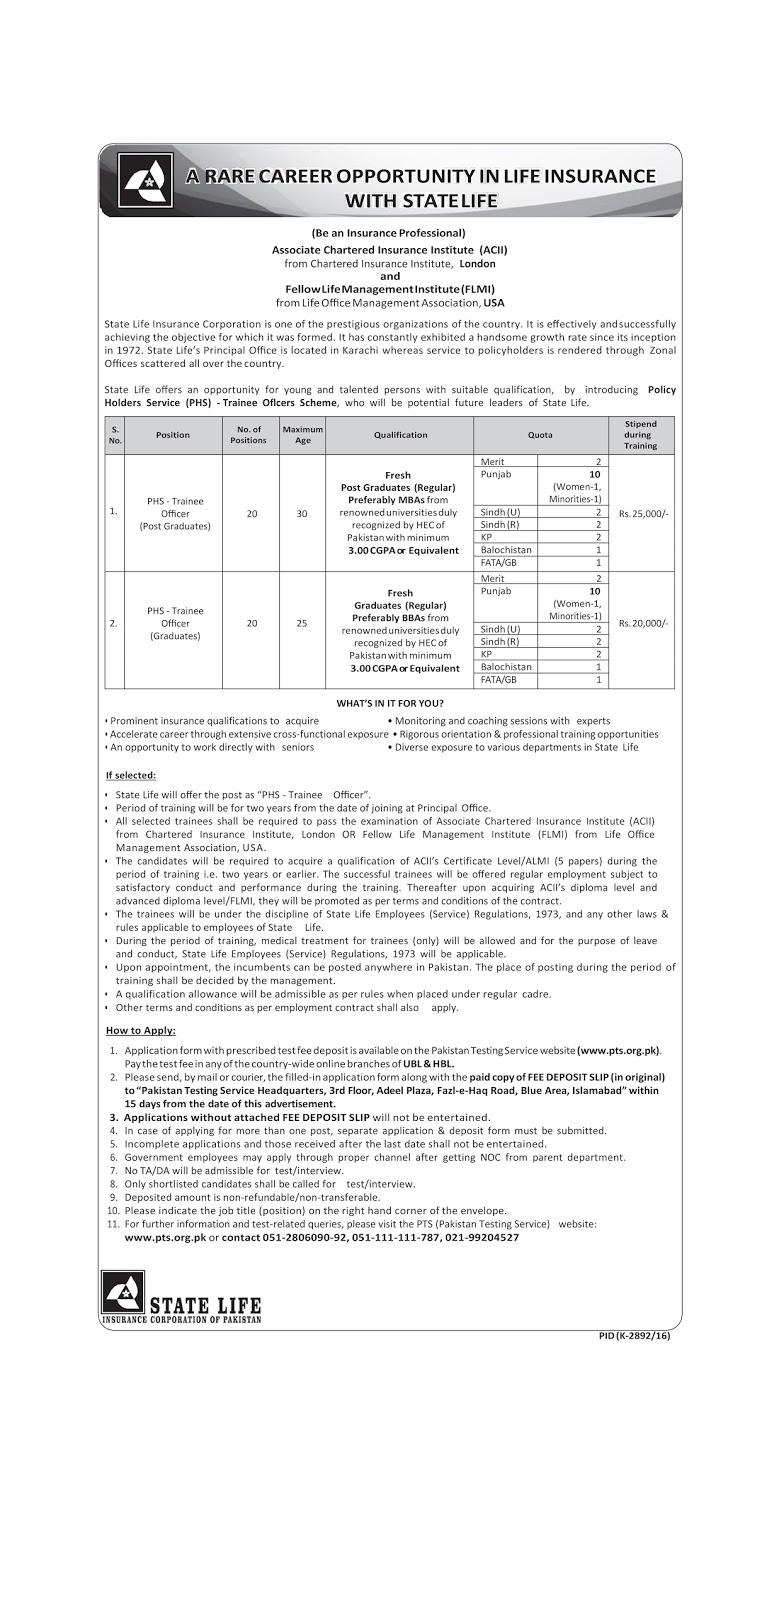 State Life Insurance Company (SLIC) - PHS Trainee Jobs Before 20 February 2017